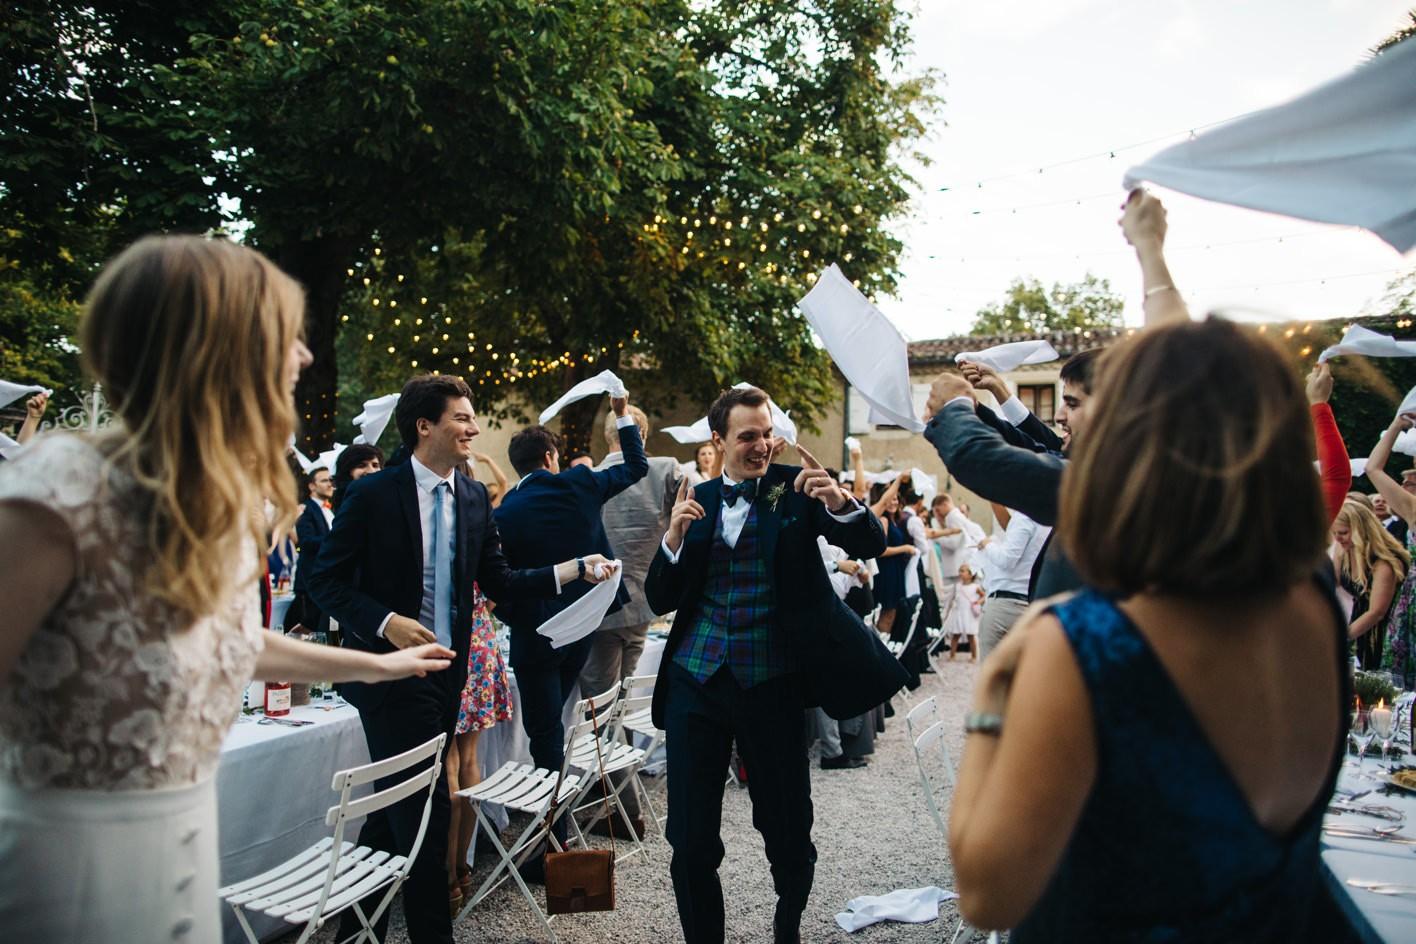 groom making an entrance at courtyard wedding reception